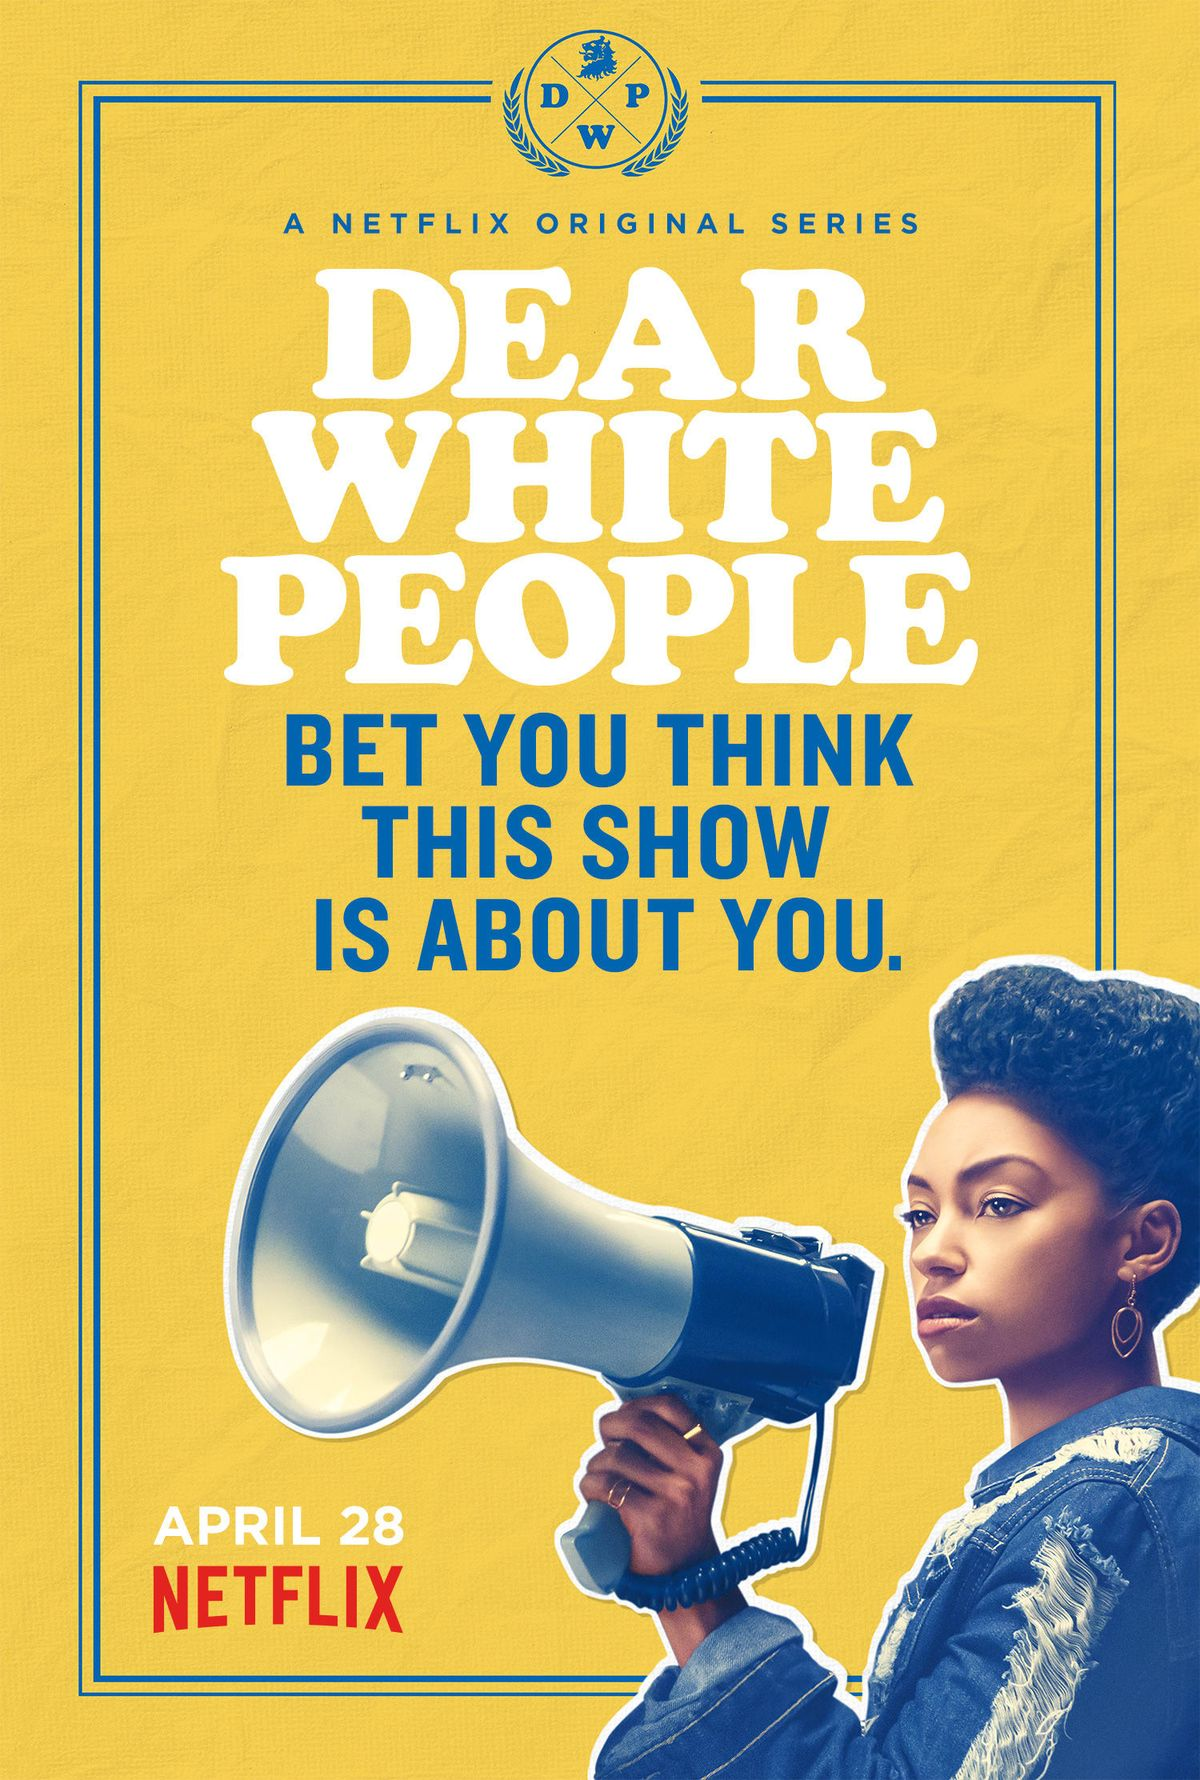 Dear White People: An Awakening